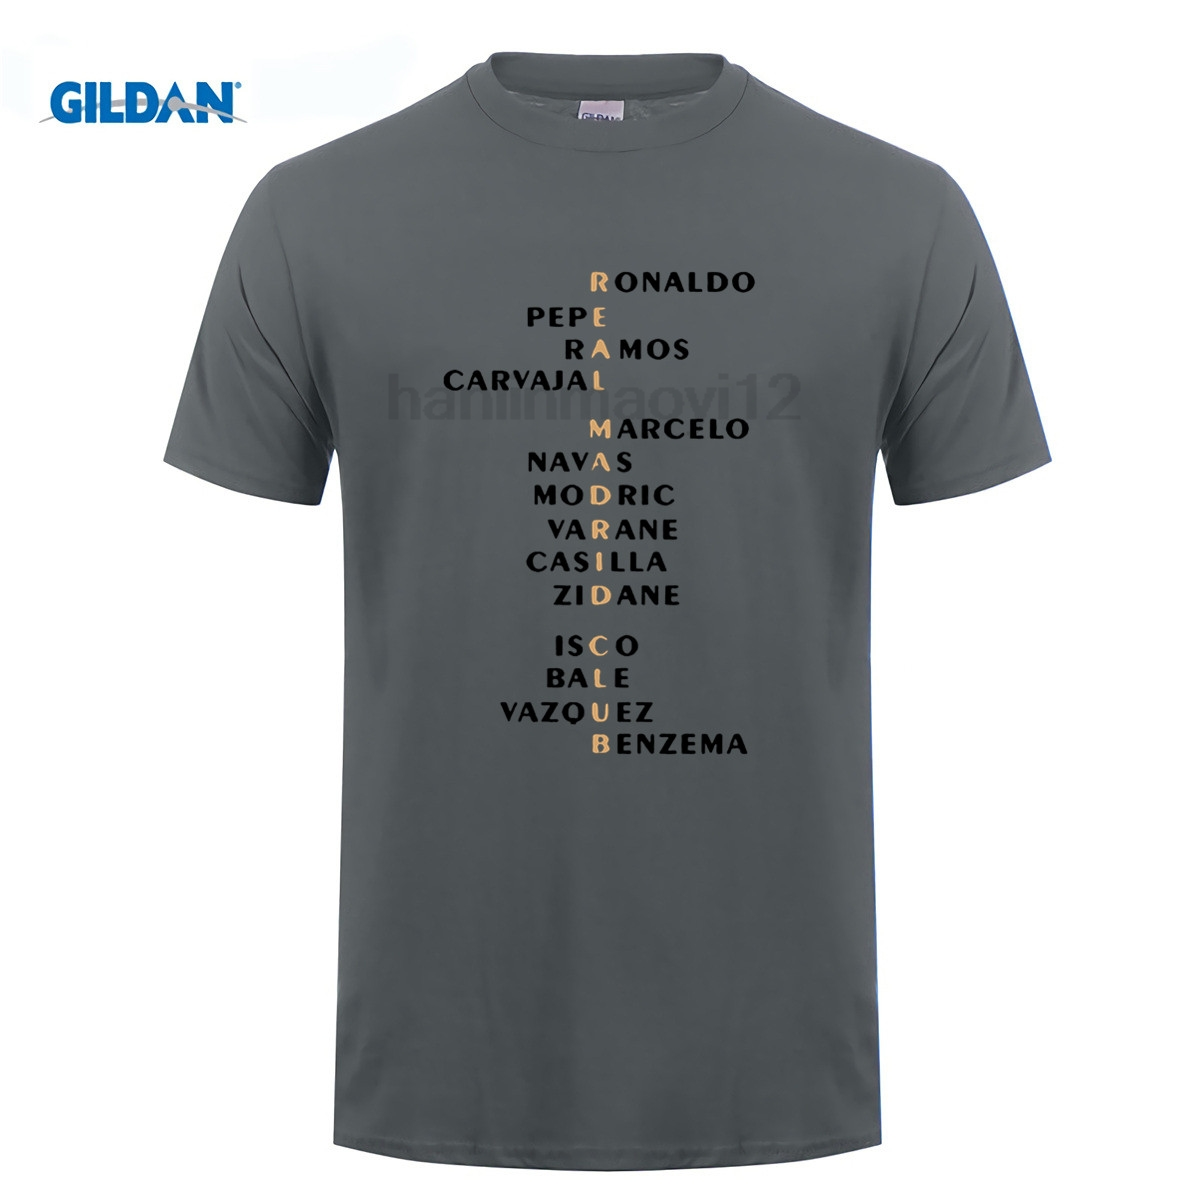 GILDAN madrid team all name Cristiano Ronaldo shirts bale benzema Short Sleeve T Shirt Man casual for real fans gift